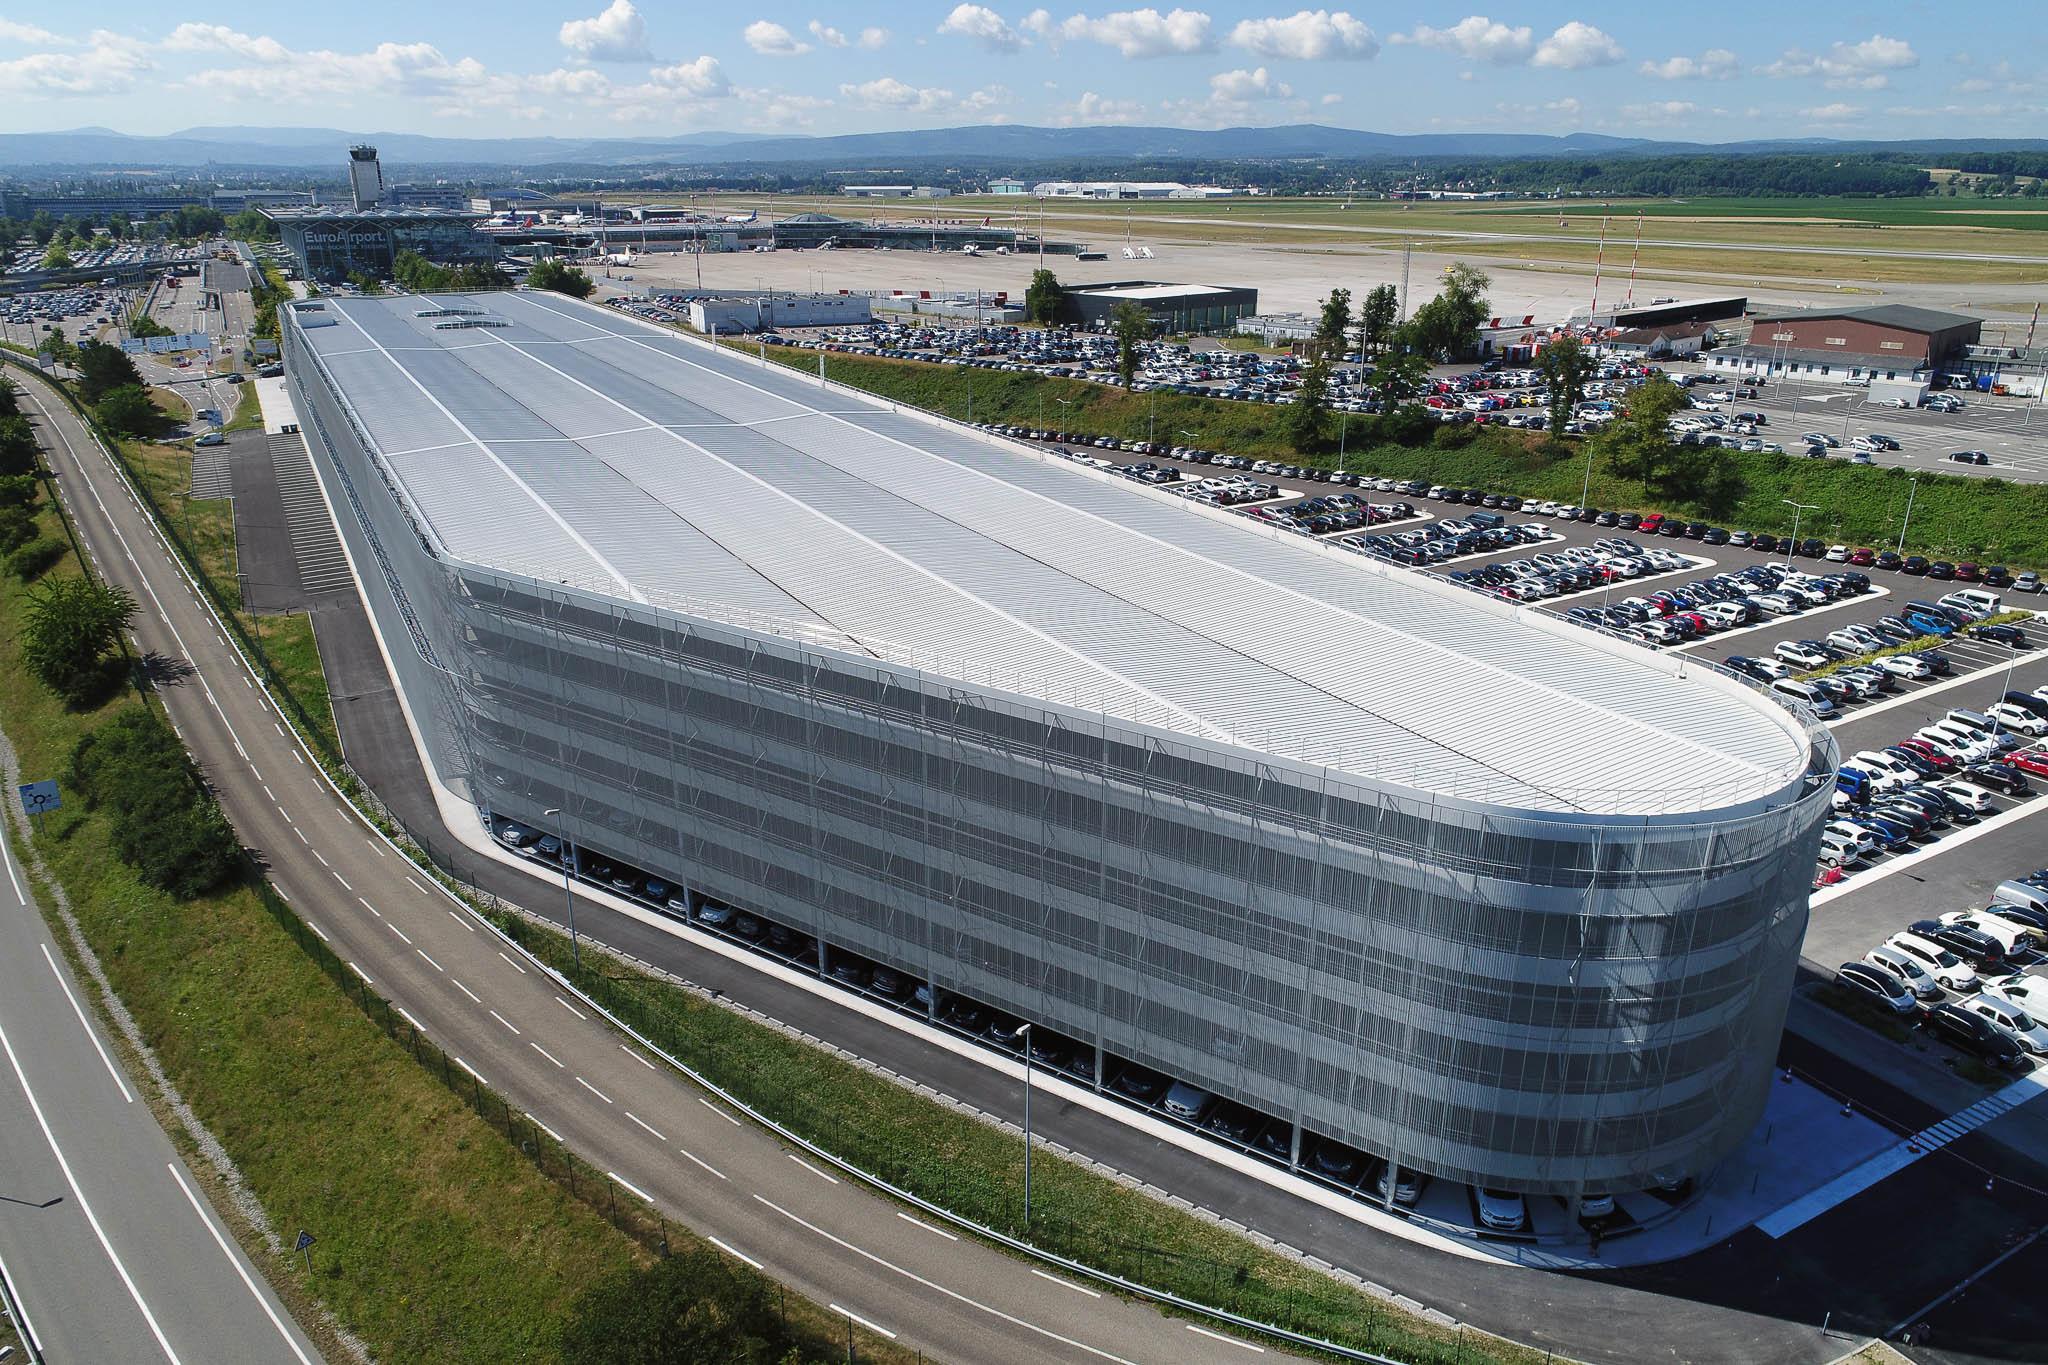 EuroAirport P4/P7 – Mulhouse (68)